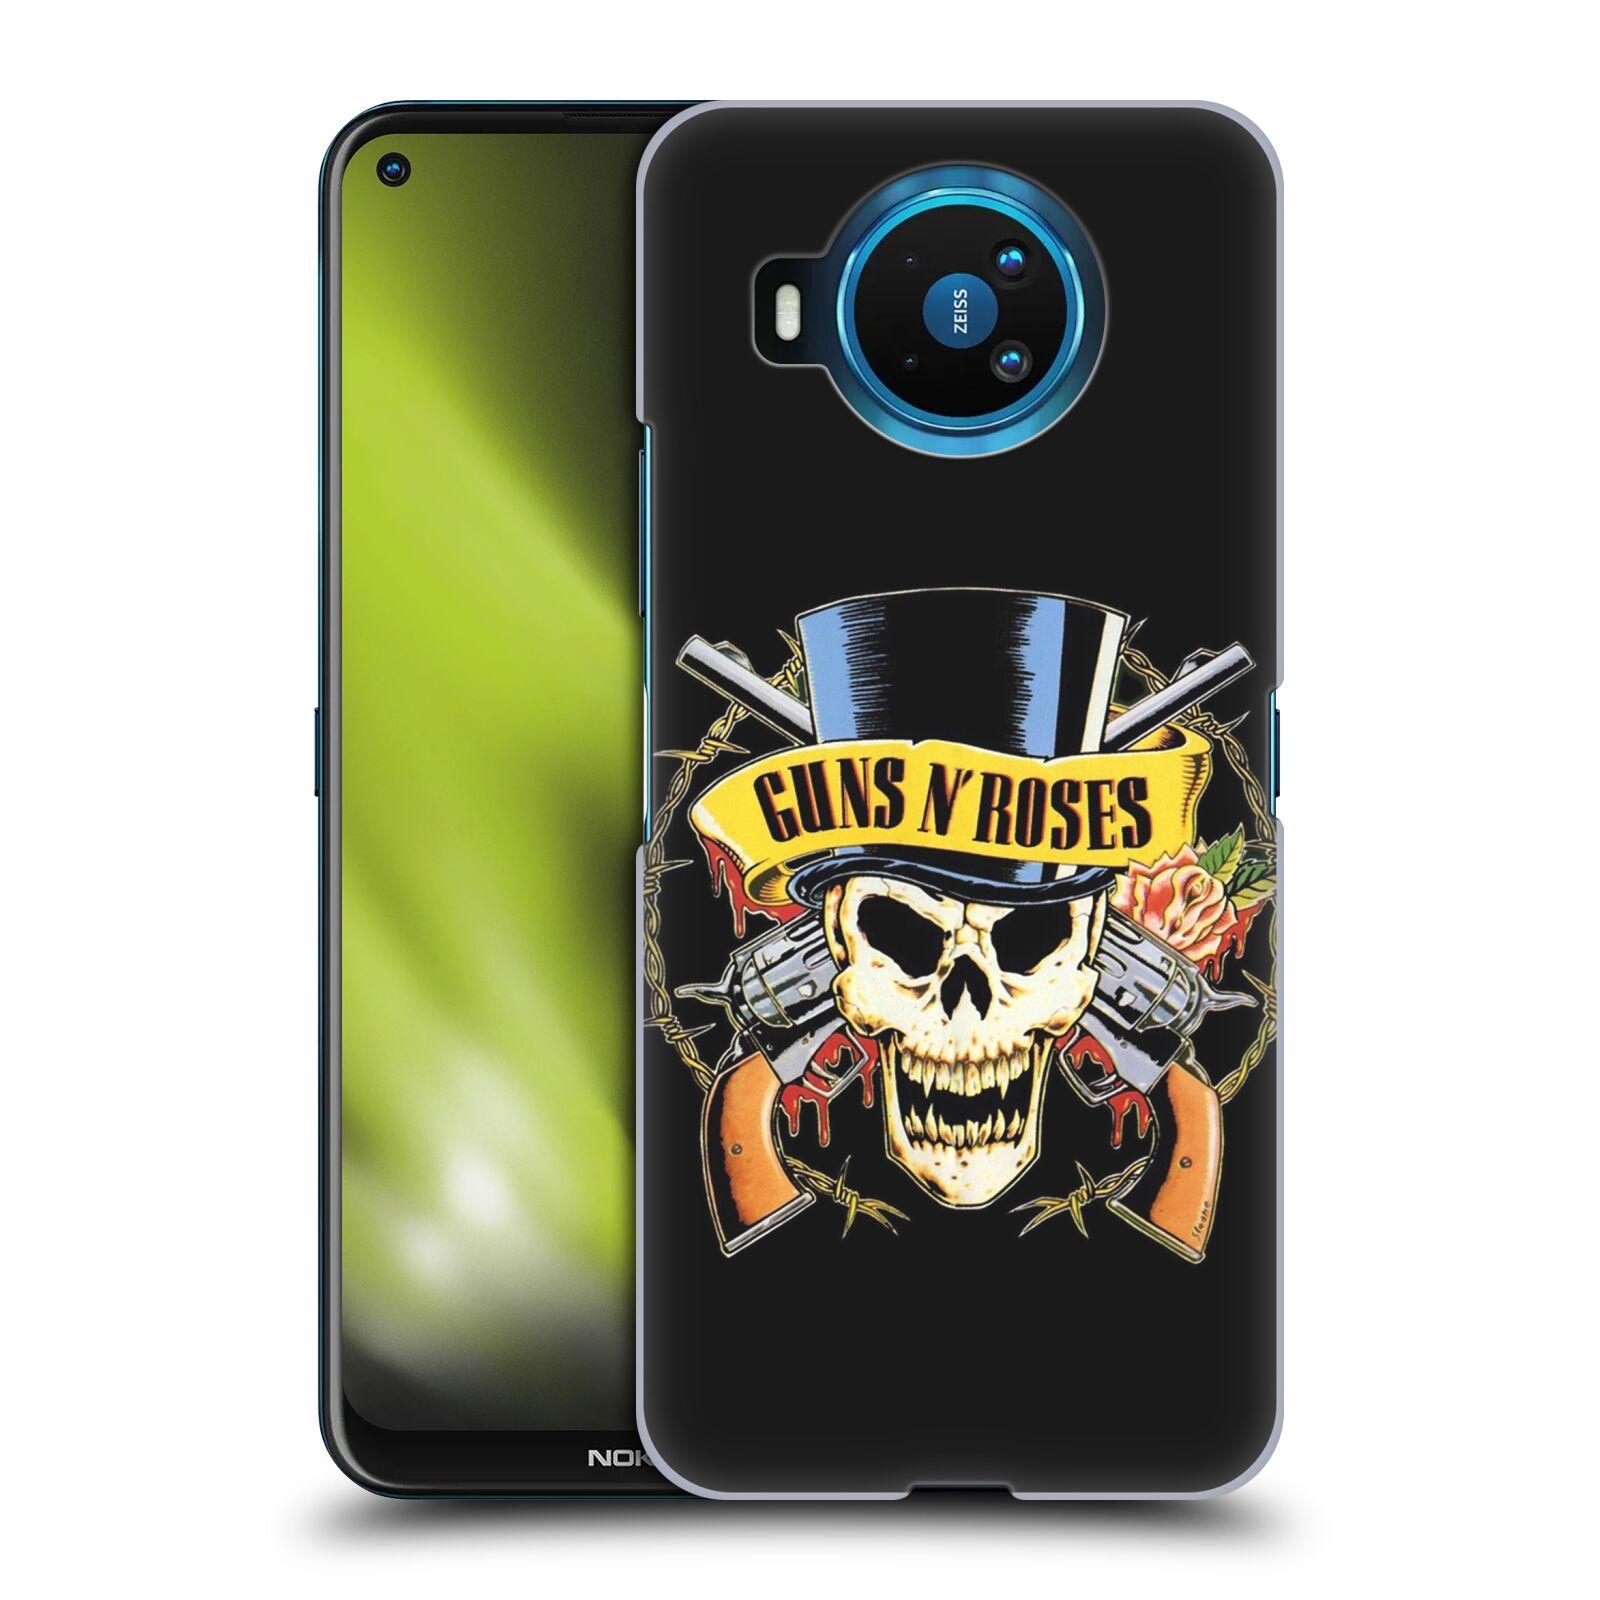 Plastové pouzdro na mobil Nokia 8.3 5G - Head Case - Guns N' Roses - Lebka